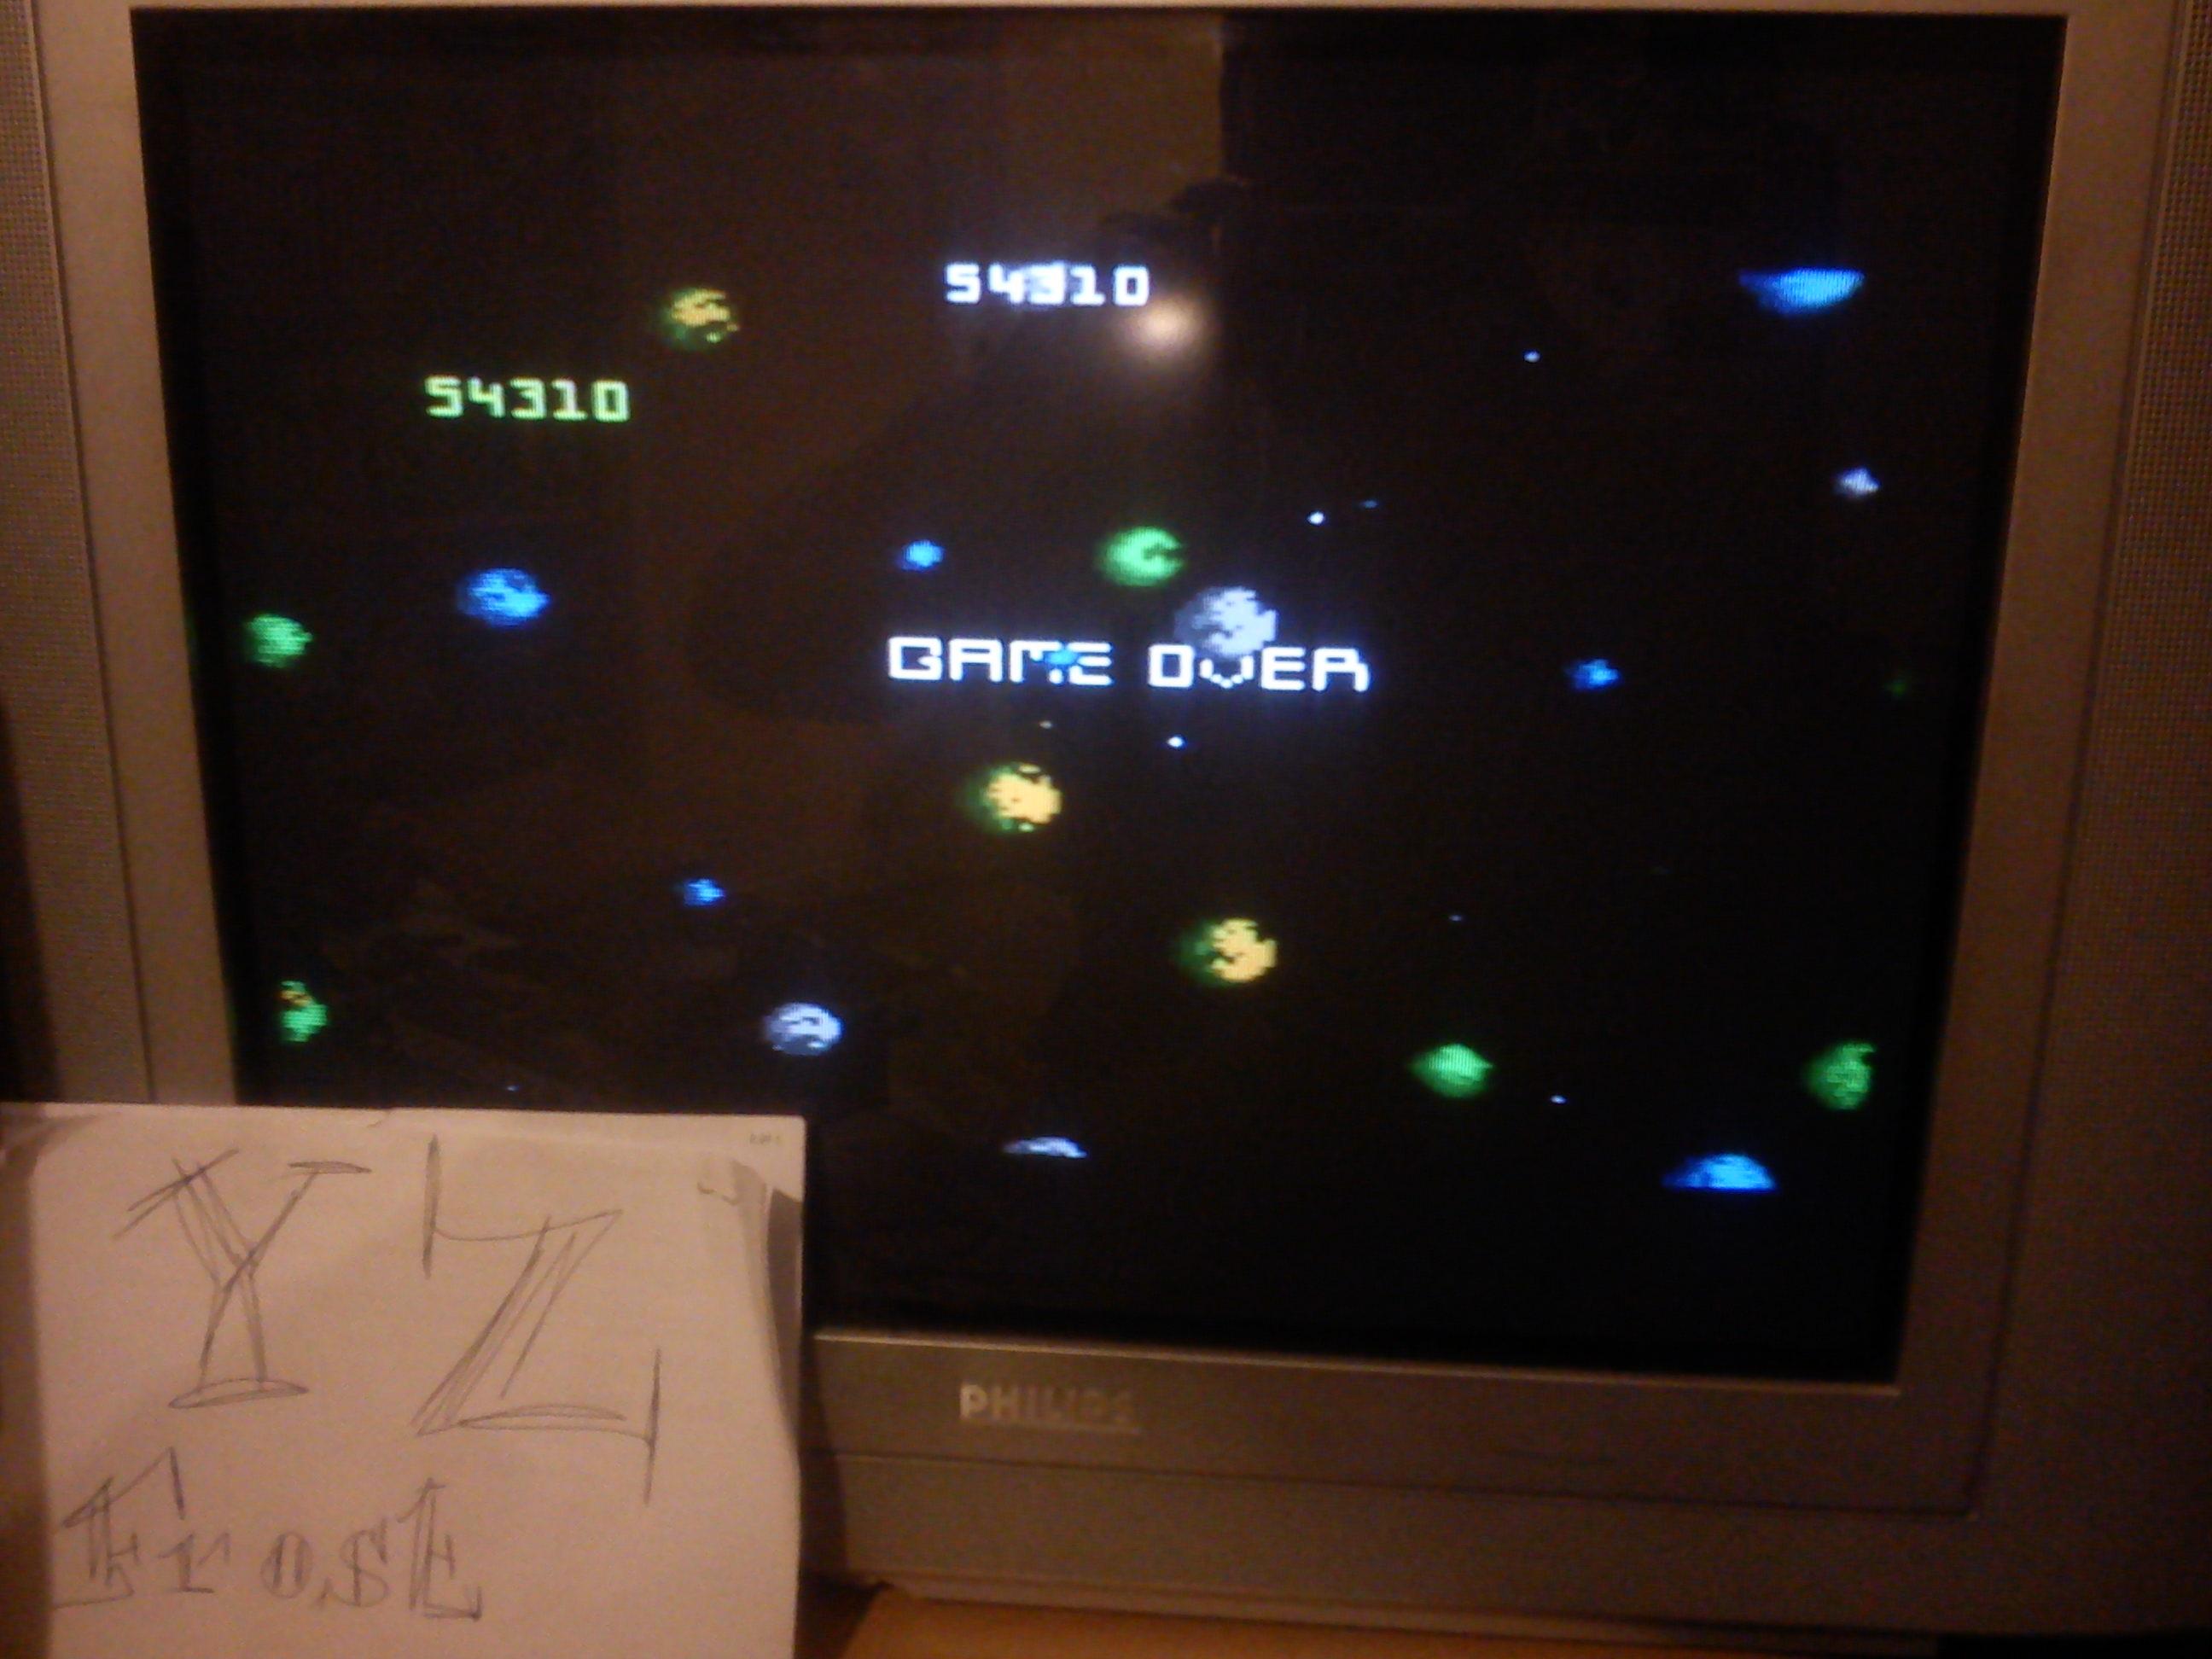 Asteroids: Intermediate 54,310 points